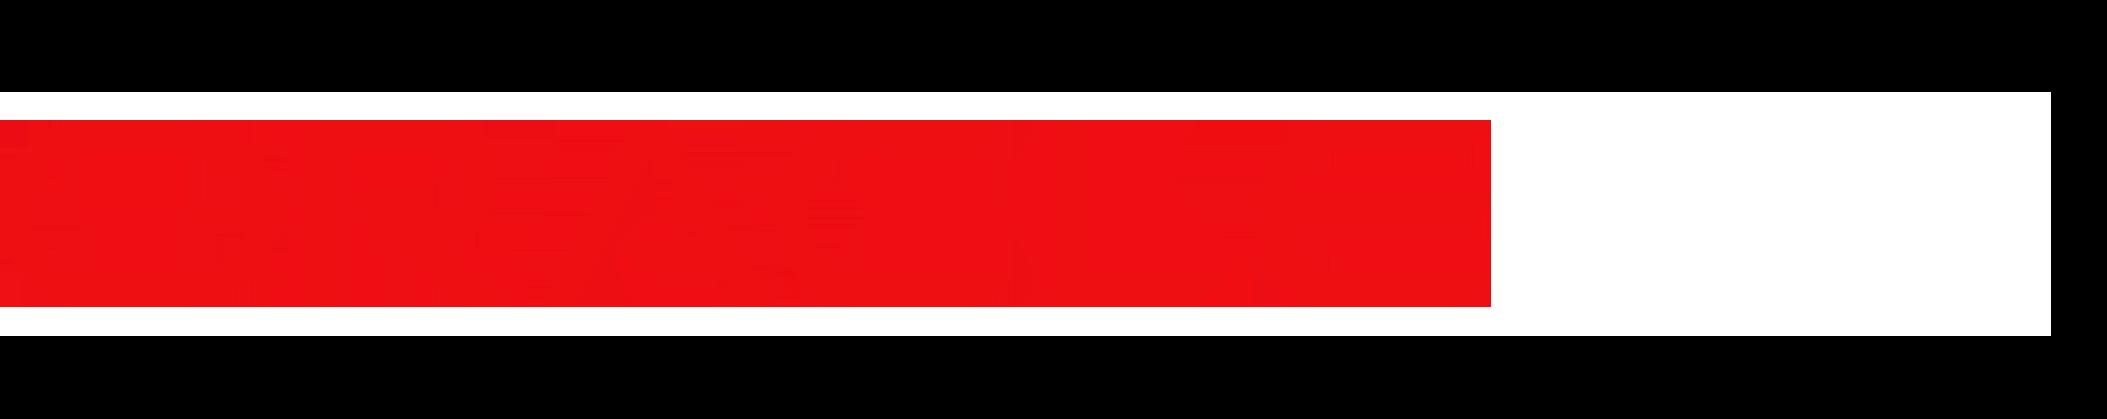 oracle-logo-white.png